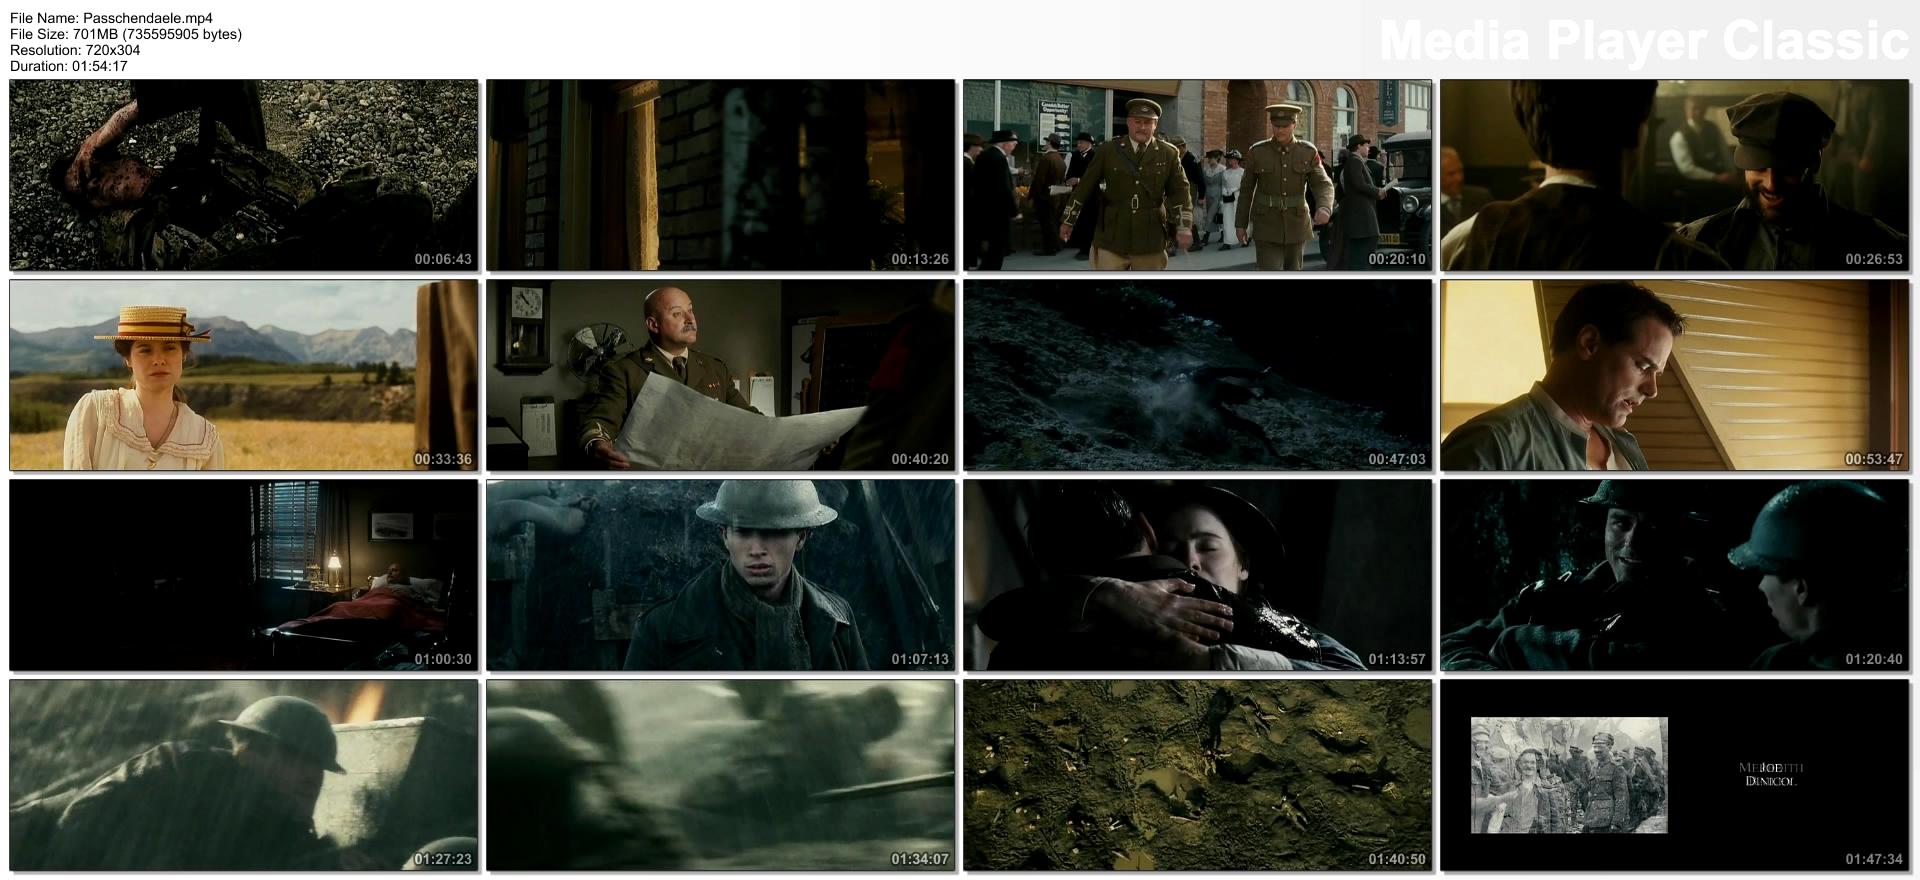 Passchendaele 2008 DVDRip H264 AAC SecretMyth (Kingdom Release) preview 1